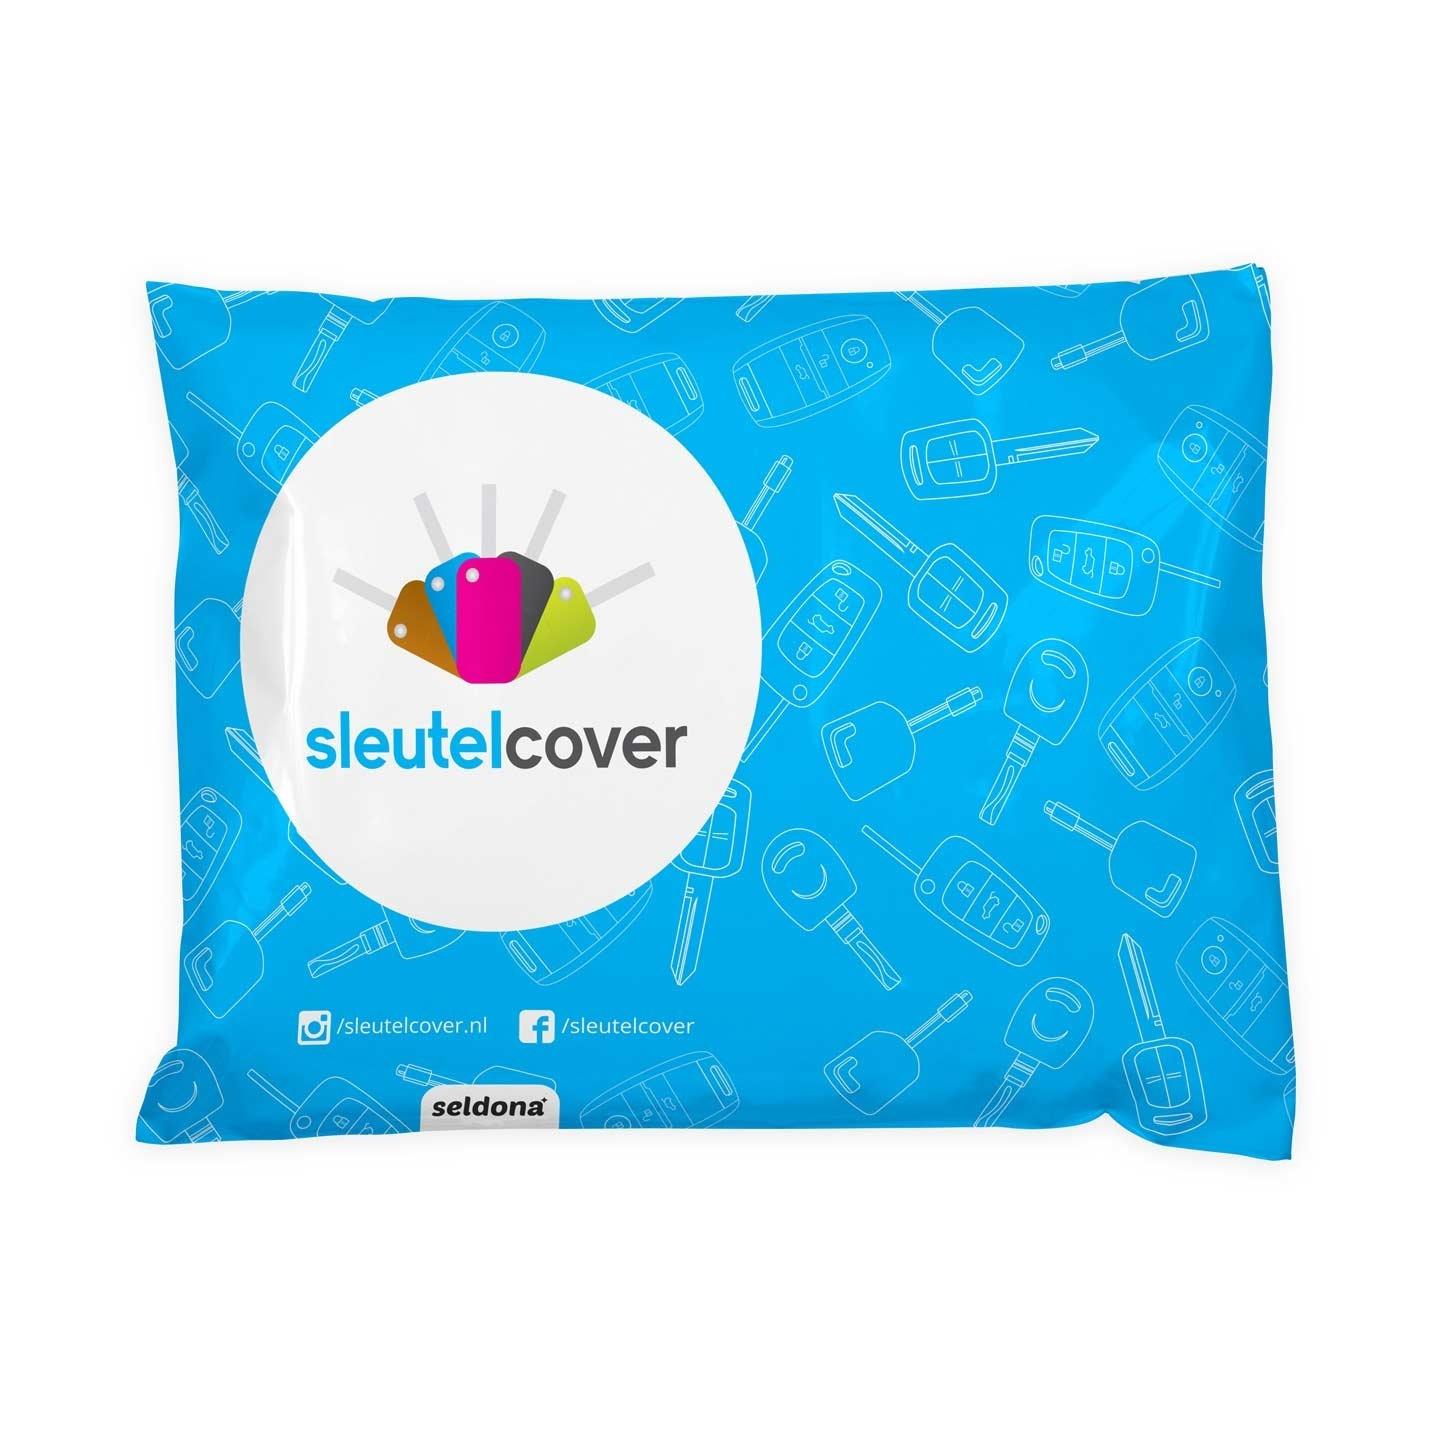 Dacia SleutelCover - Lichtblauw / Silicone sleutelhoesje / beschermhoesje autosleutel